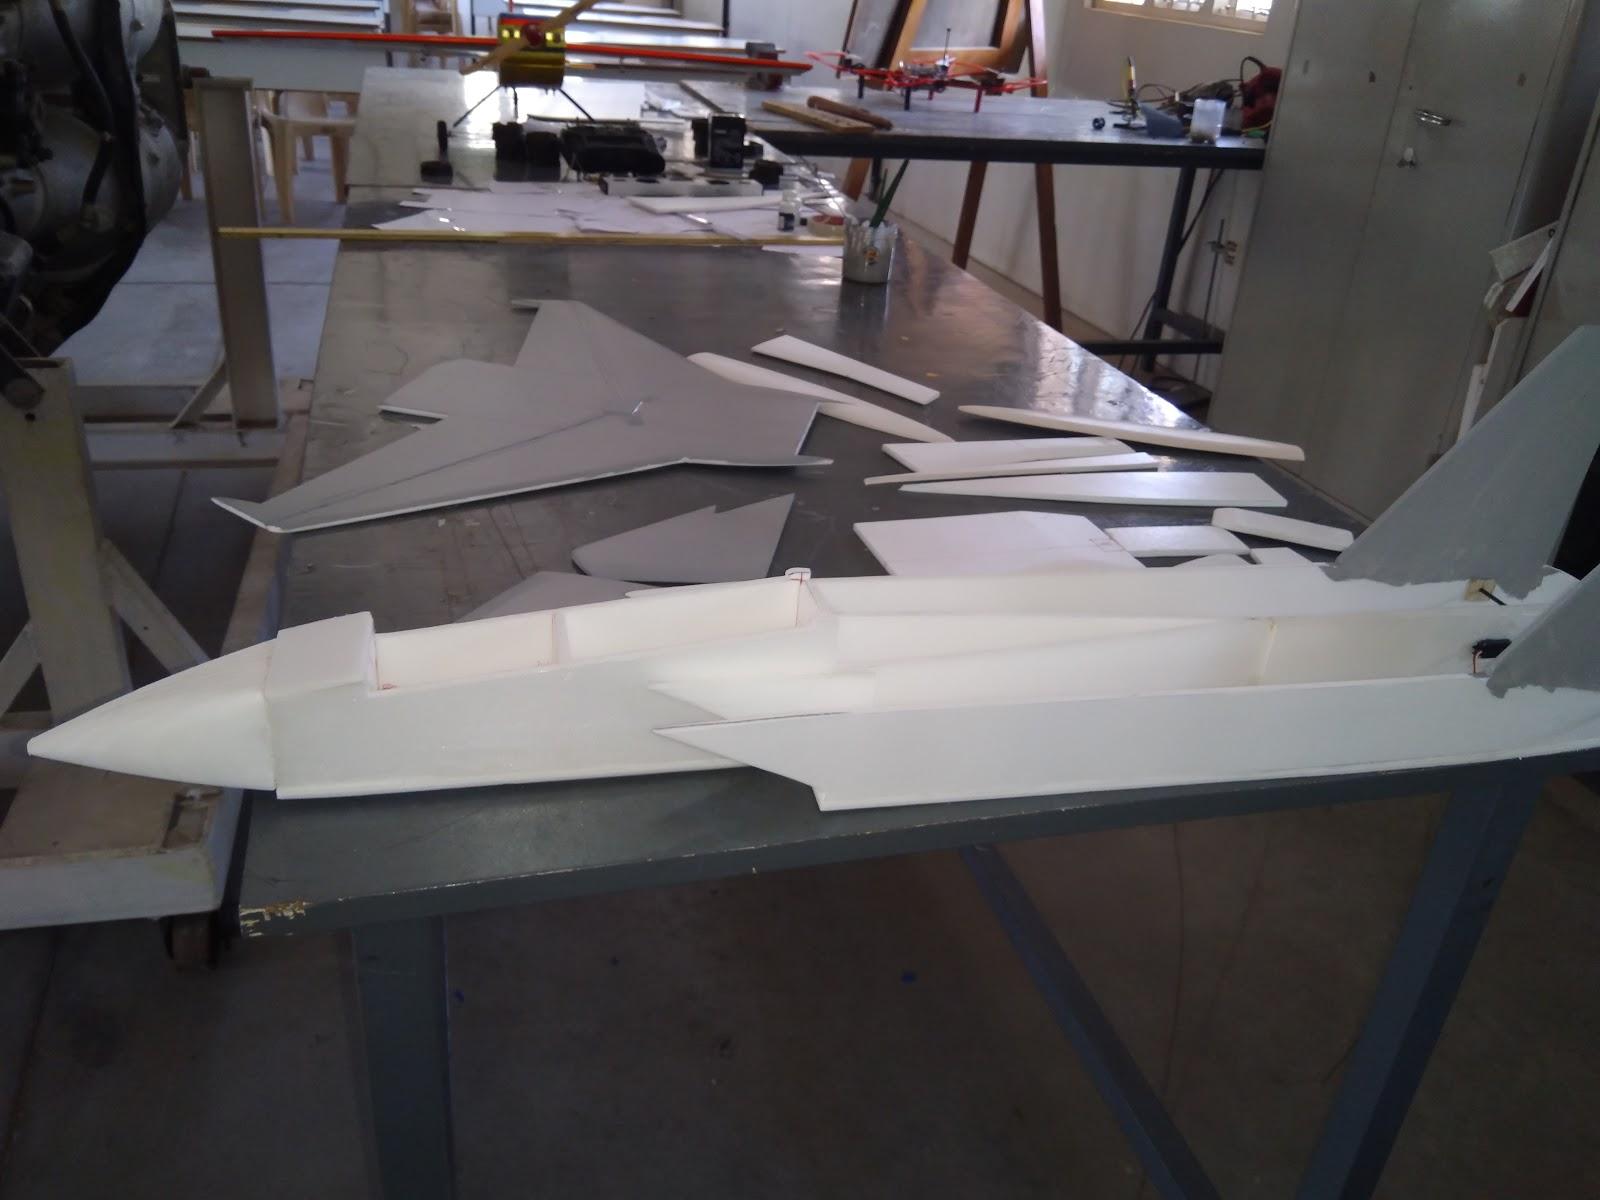 F15 Eagle - Depron Foam   Gforce-RC Planes